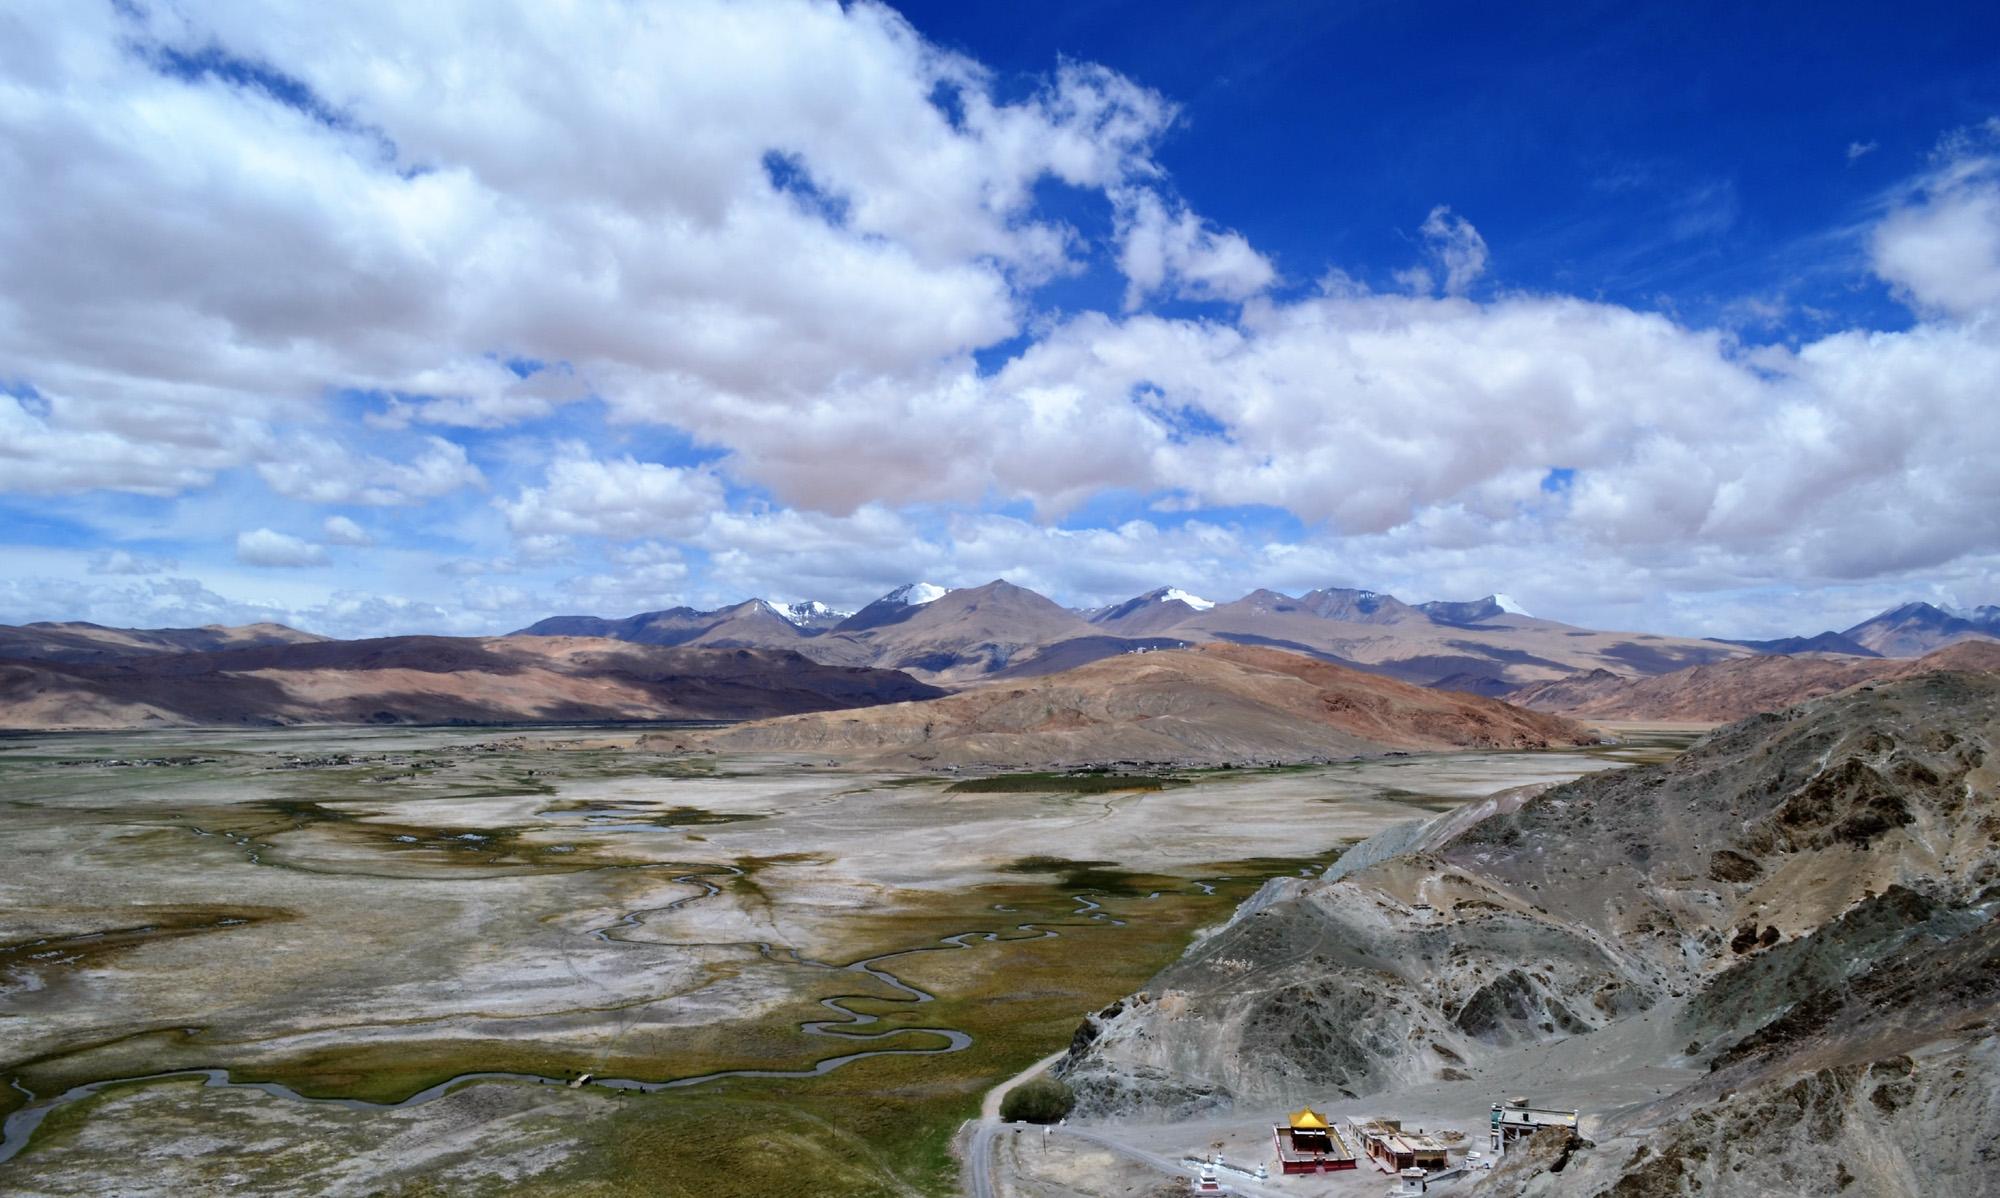 Leh-Ladakh, the land of monastery.